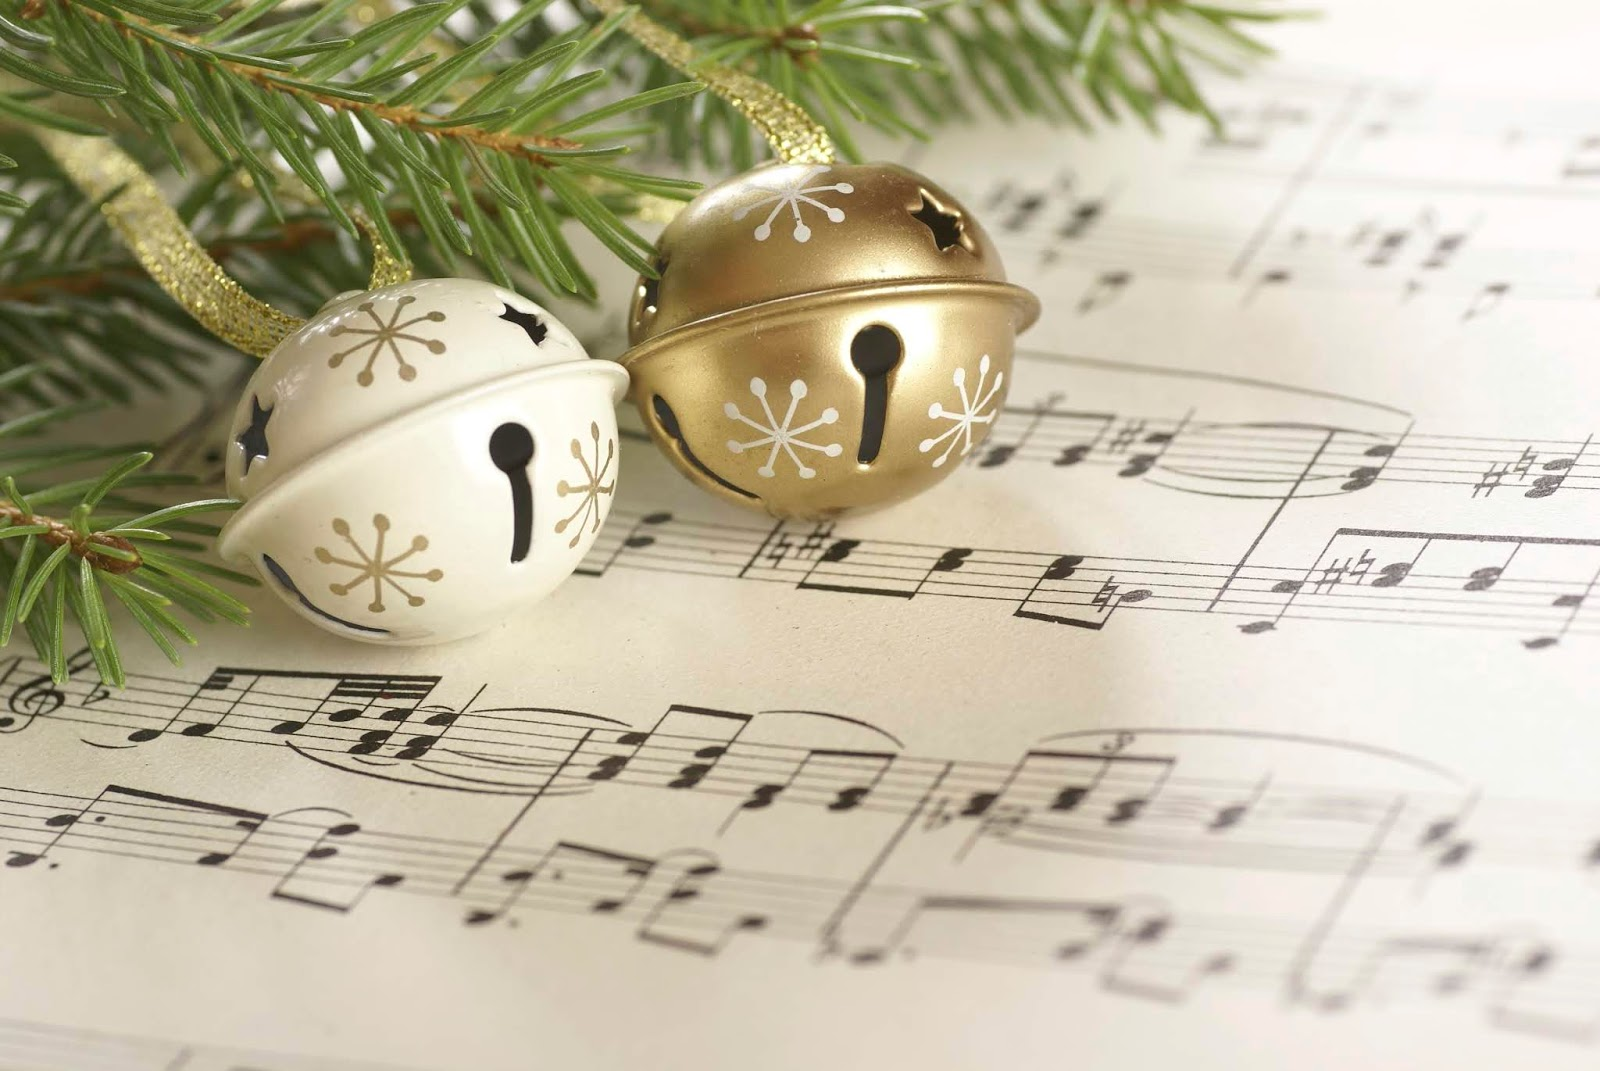 Blogmas Day 10: My Christmas Playlist